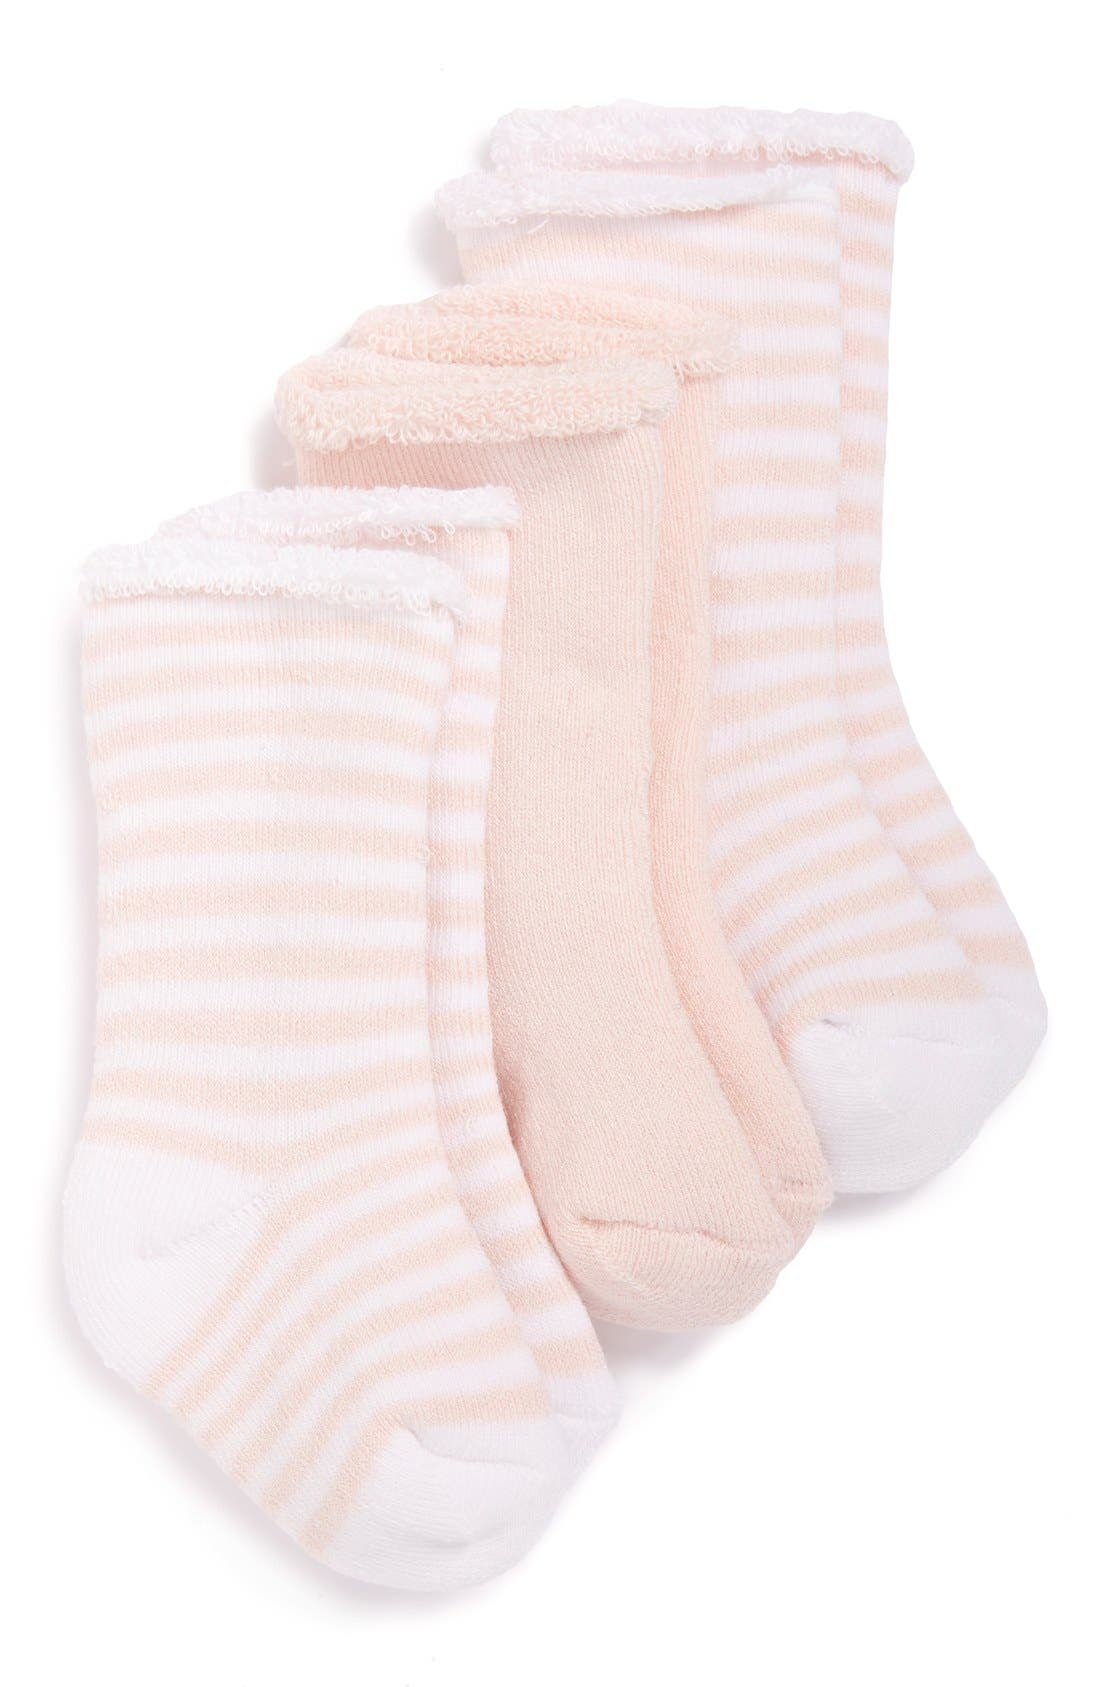 Main Image - Nordstrom Baby 3-Pack Crew Socks (Baby)